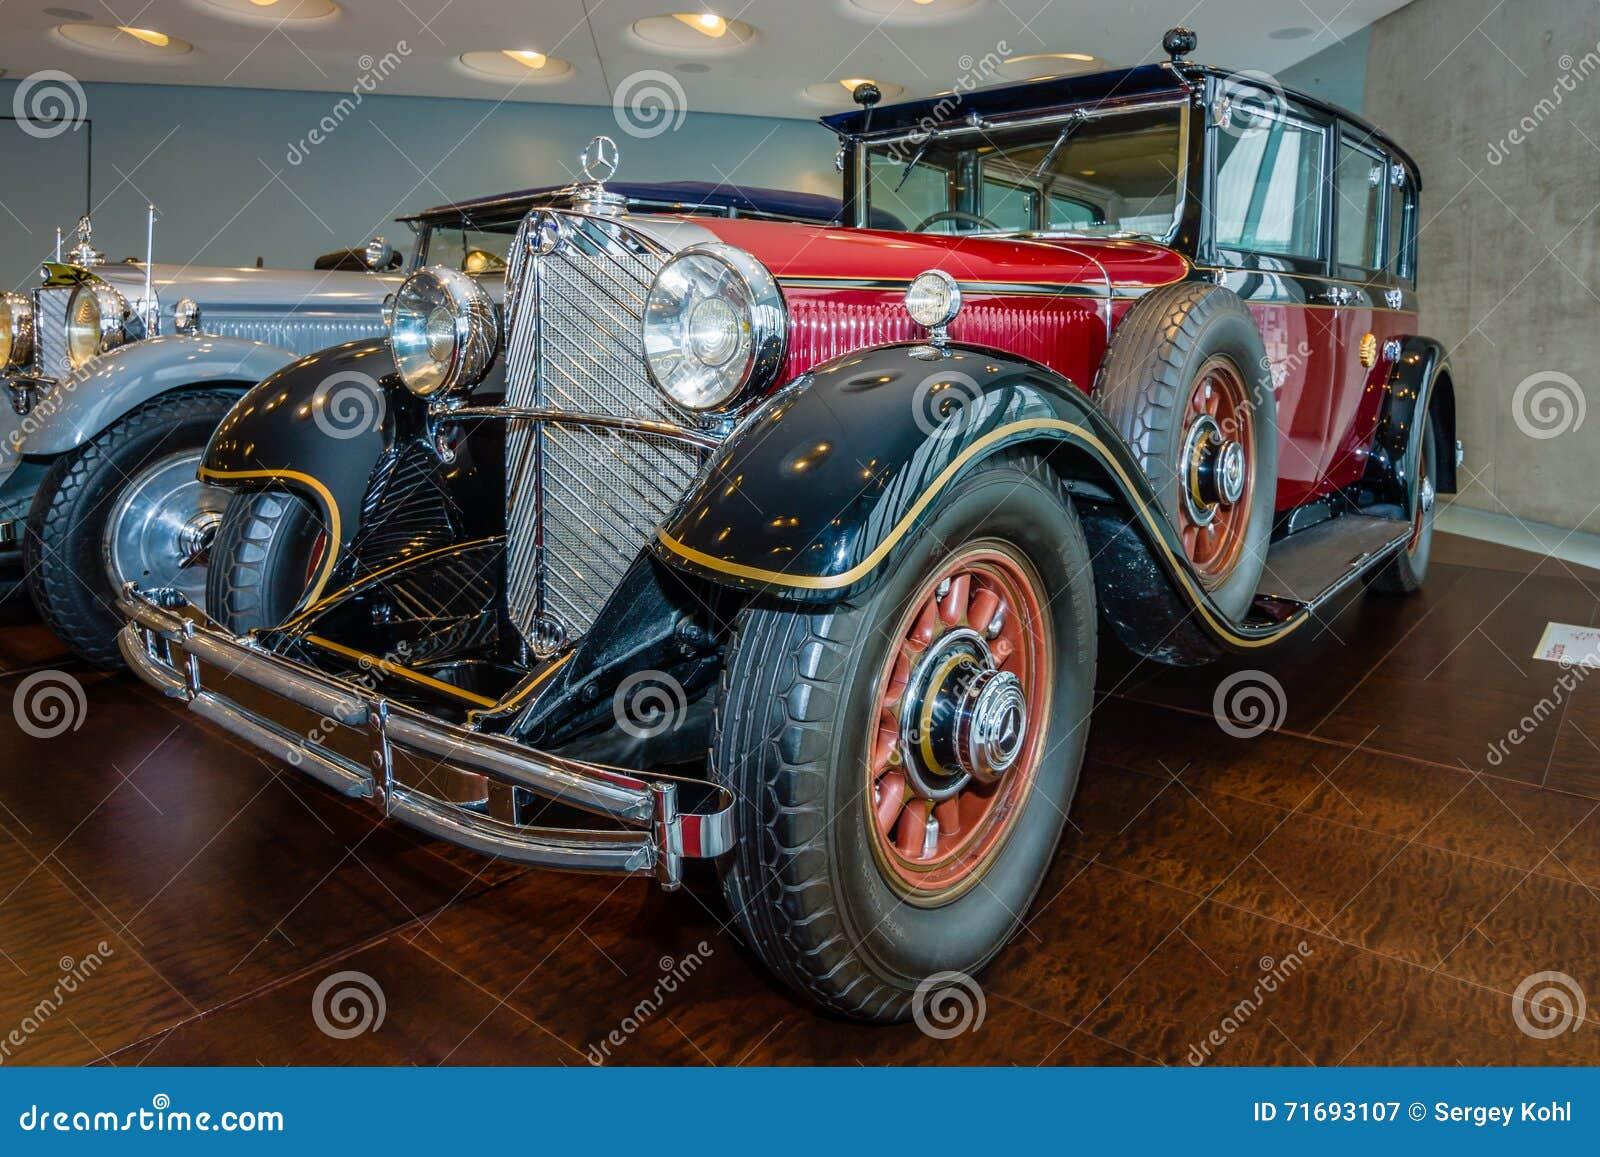 Car of emperor of japan hirohito mercedes benz 770 grand for Mercedes benz japan